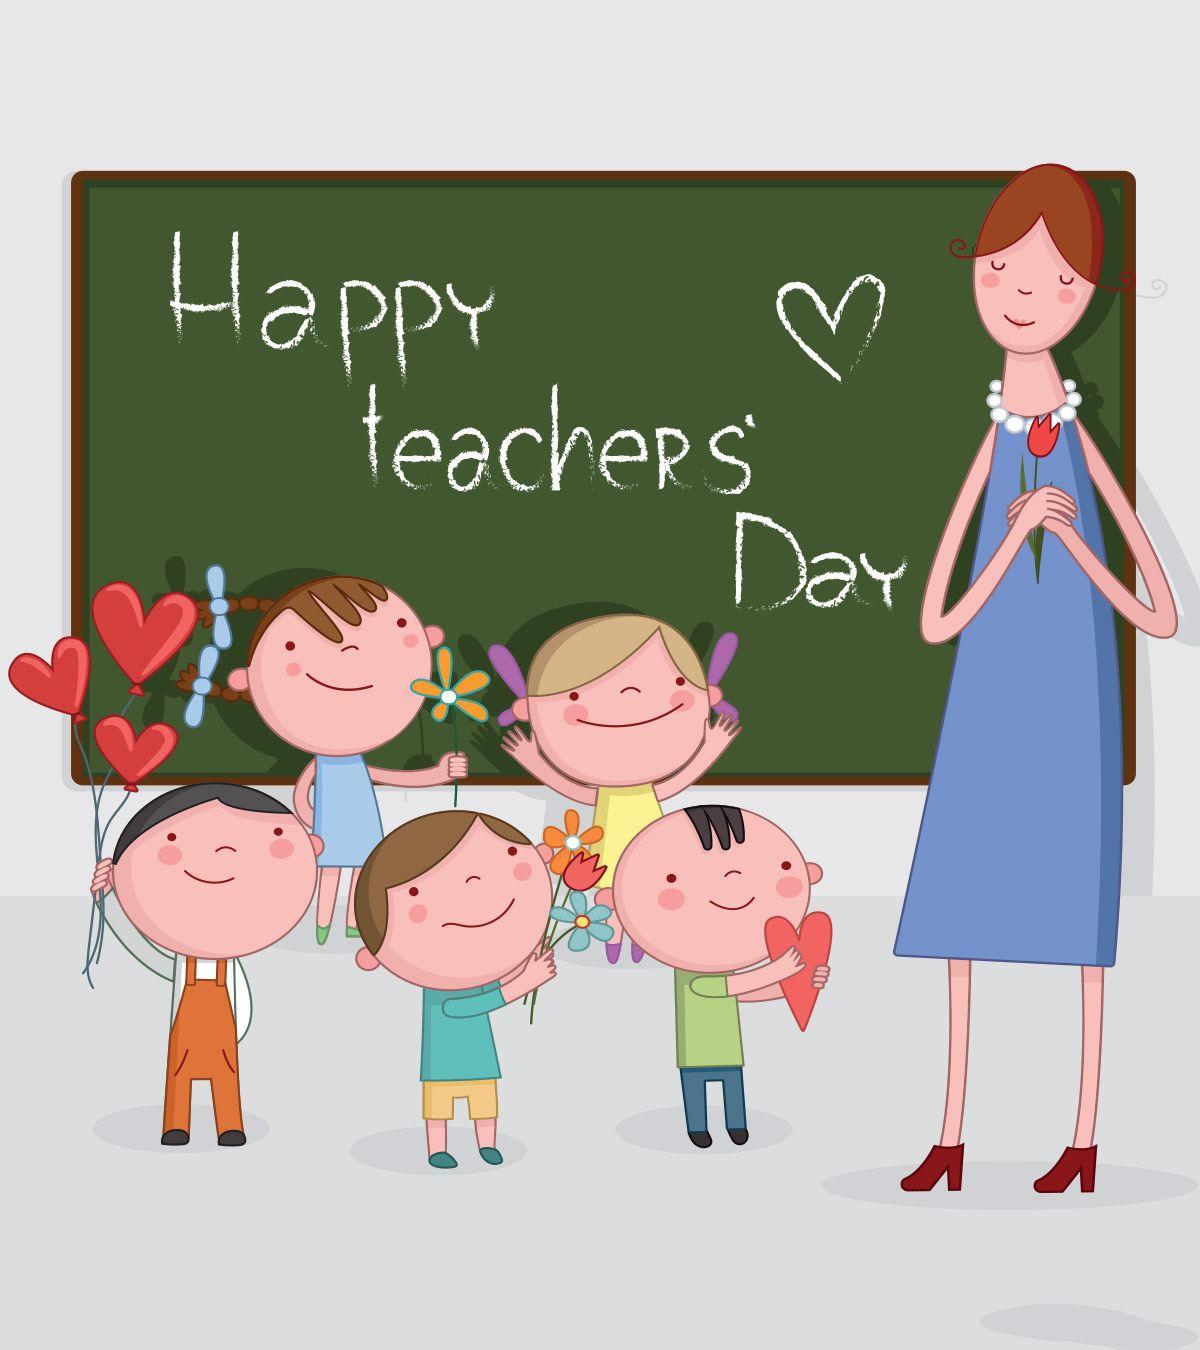 تبریک روز معلم به همسر عزیزم ، عاشقانه